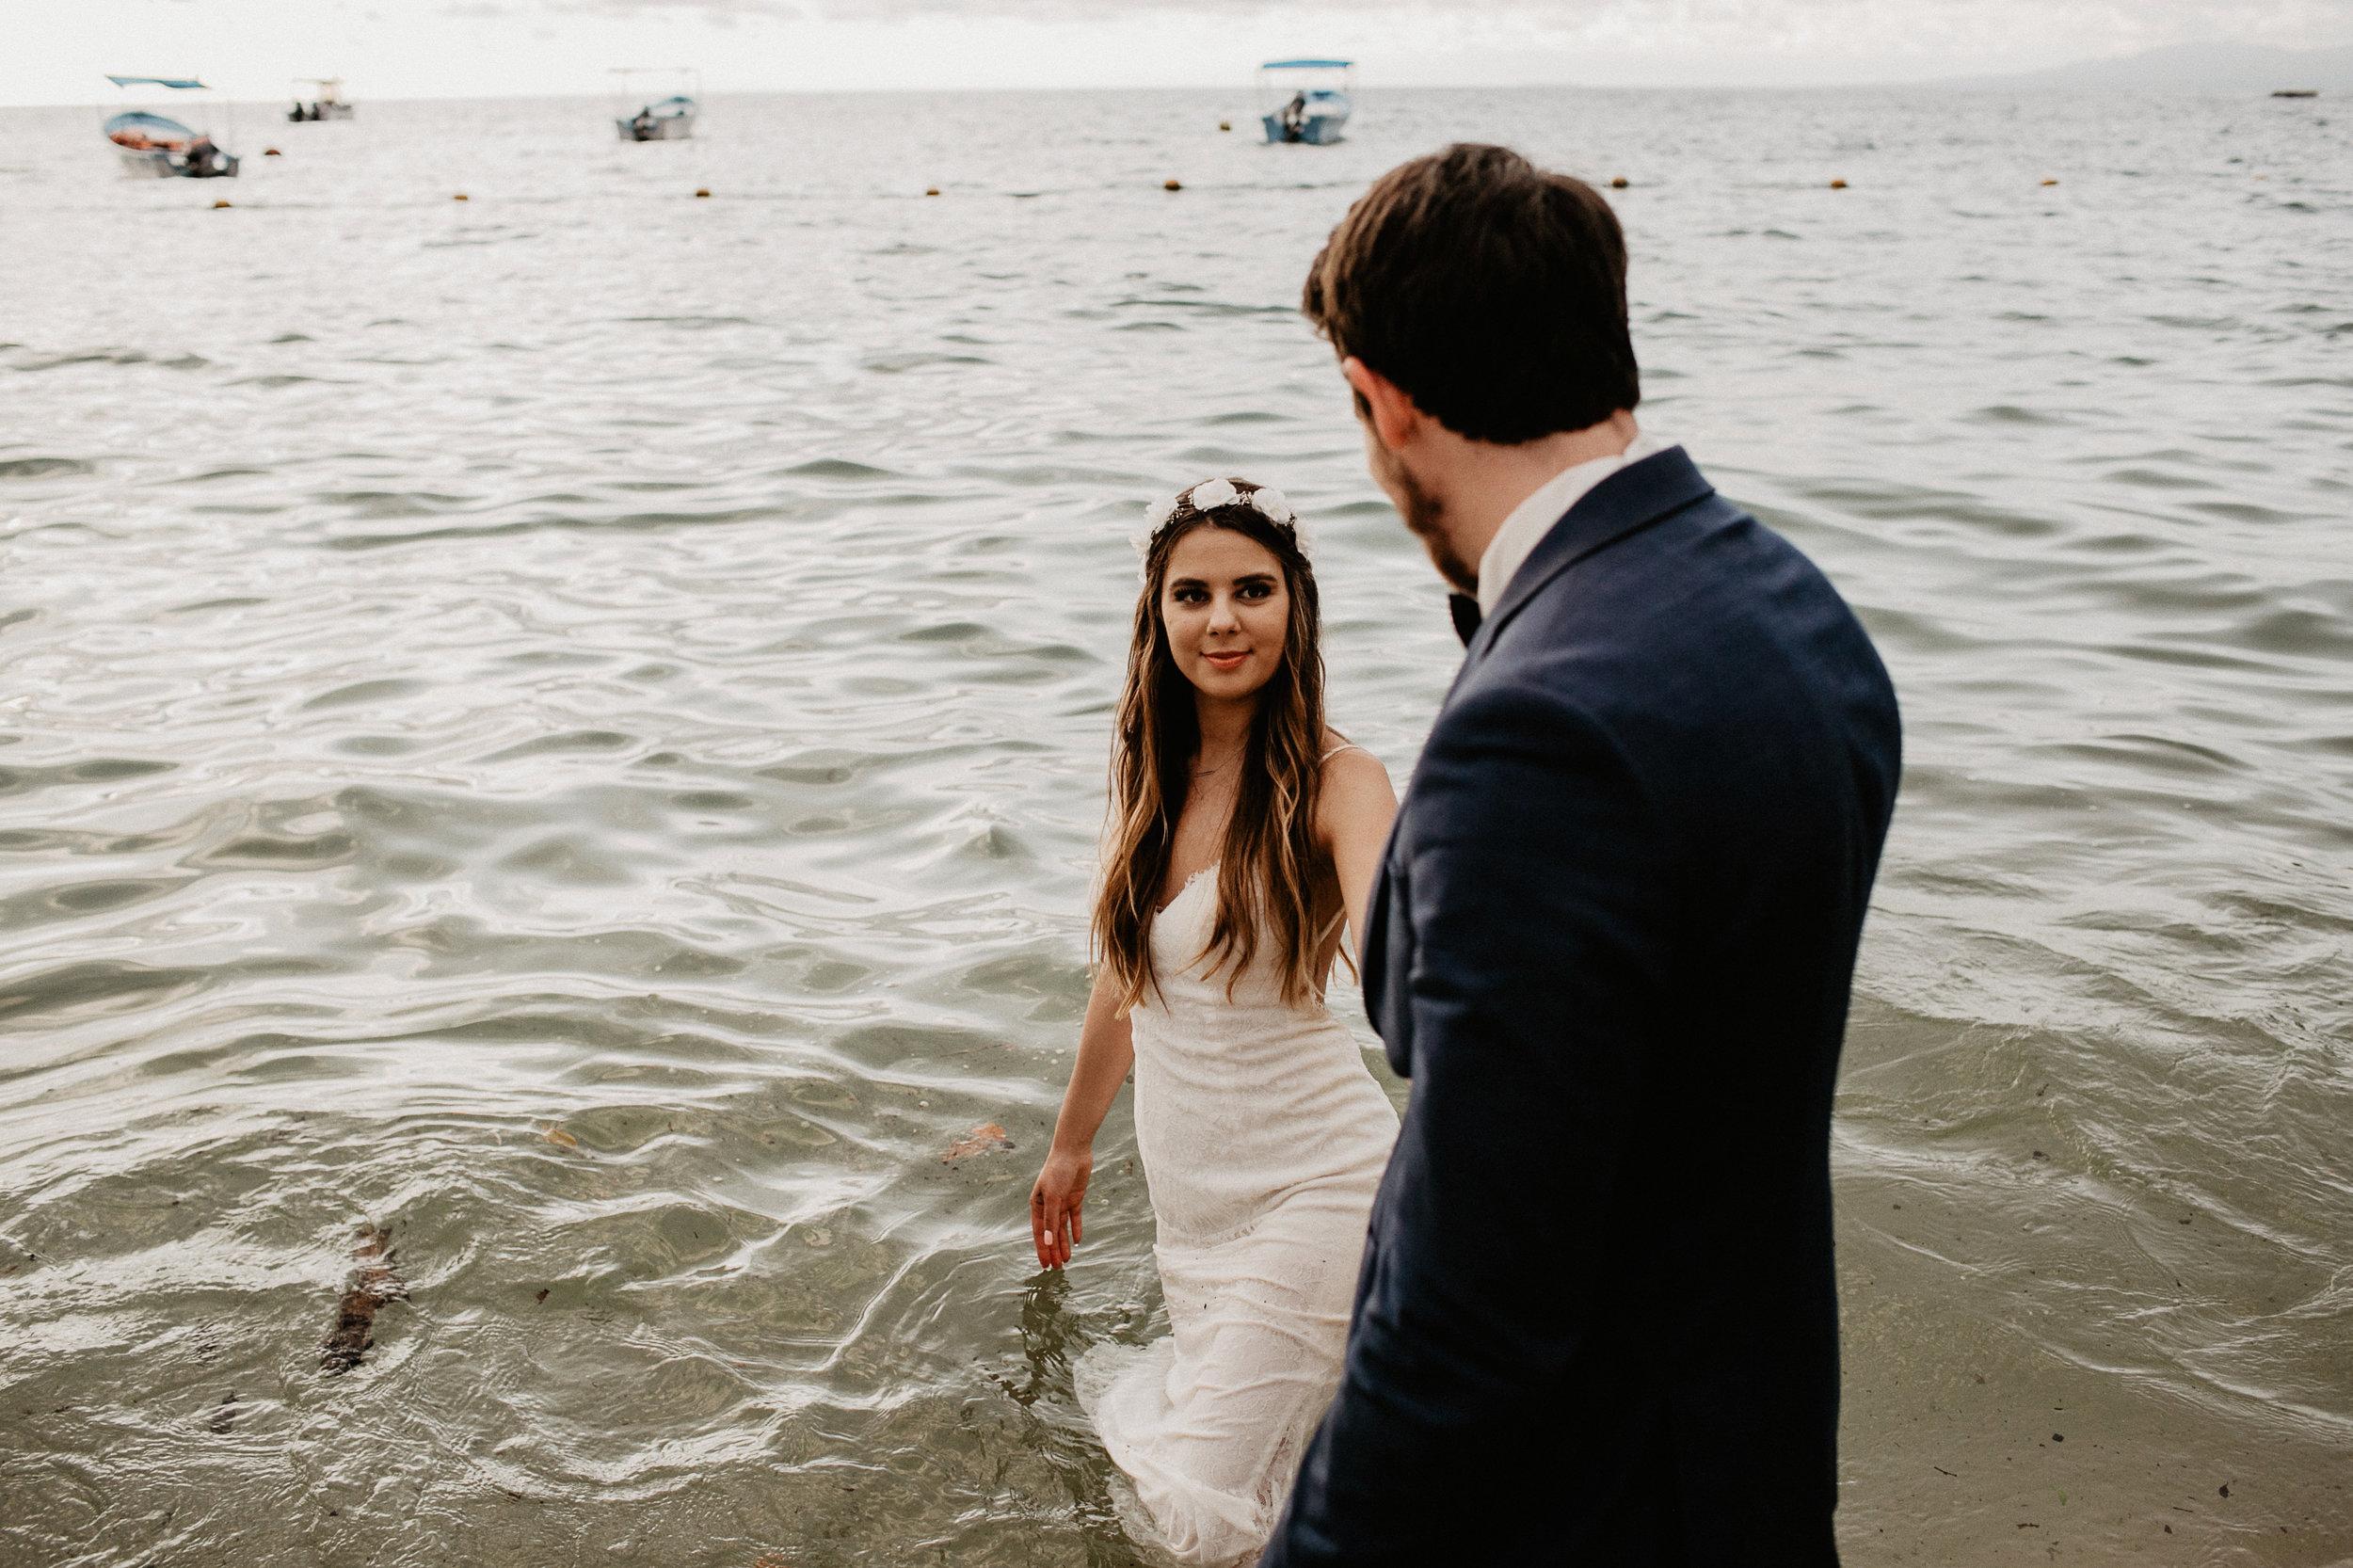 alfonso_flores_destination_wedding_photography_puerto_vallarta_hotel_barcelo_vallarta_cuttler_amela-767.JPG